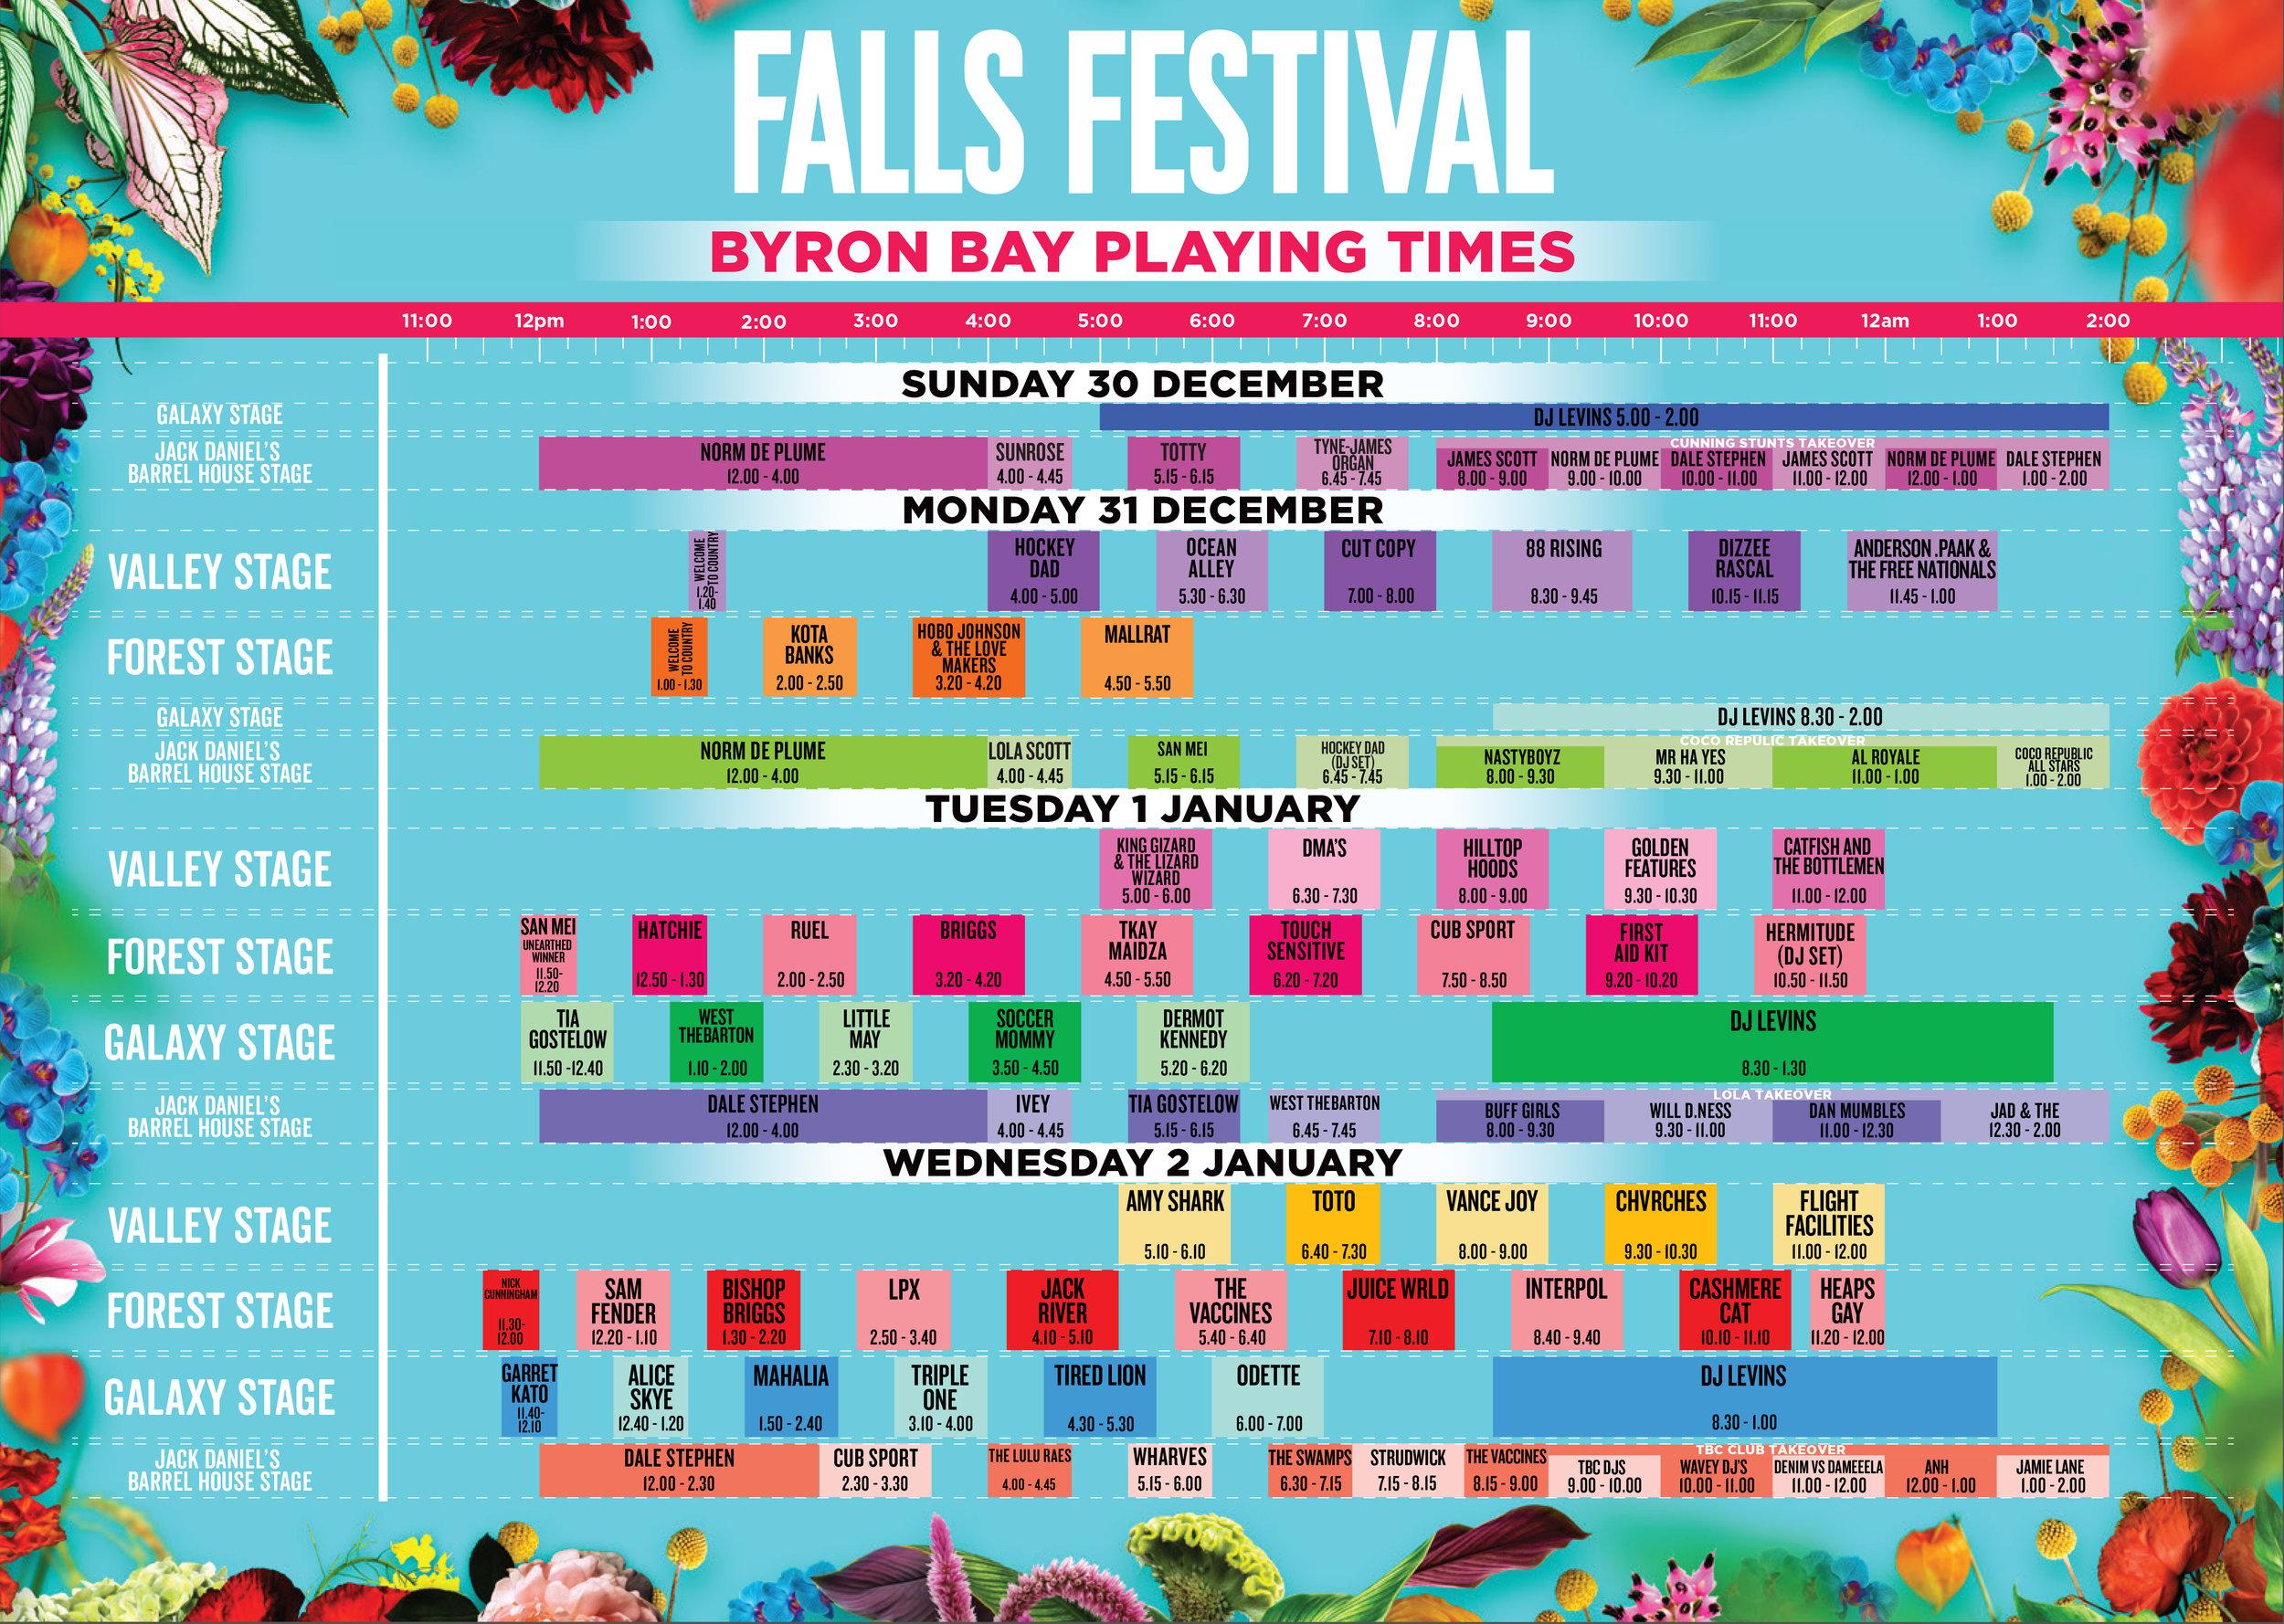 FALLS_2018_PlayingTimes_ByronBoth-1.jpg